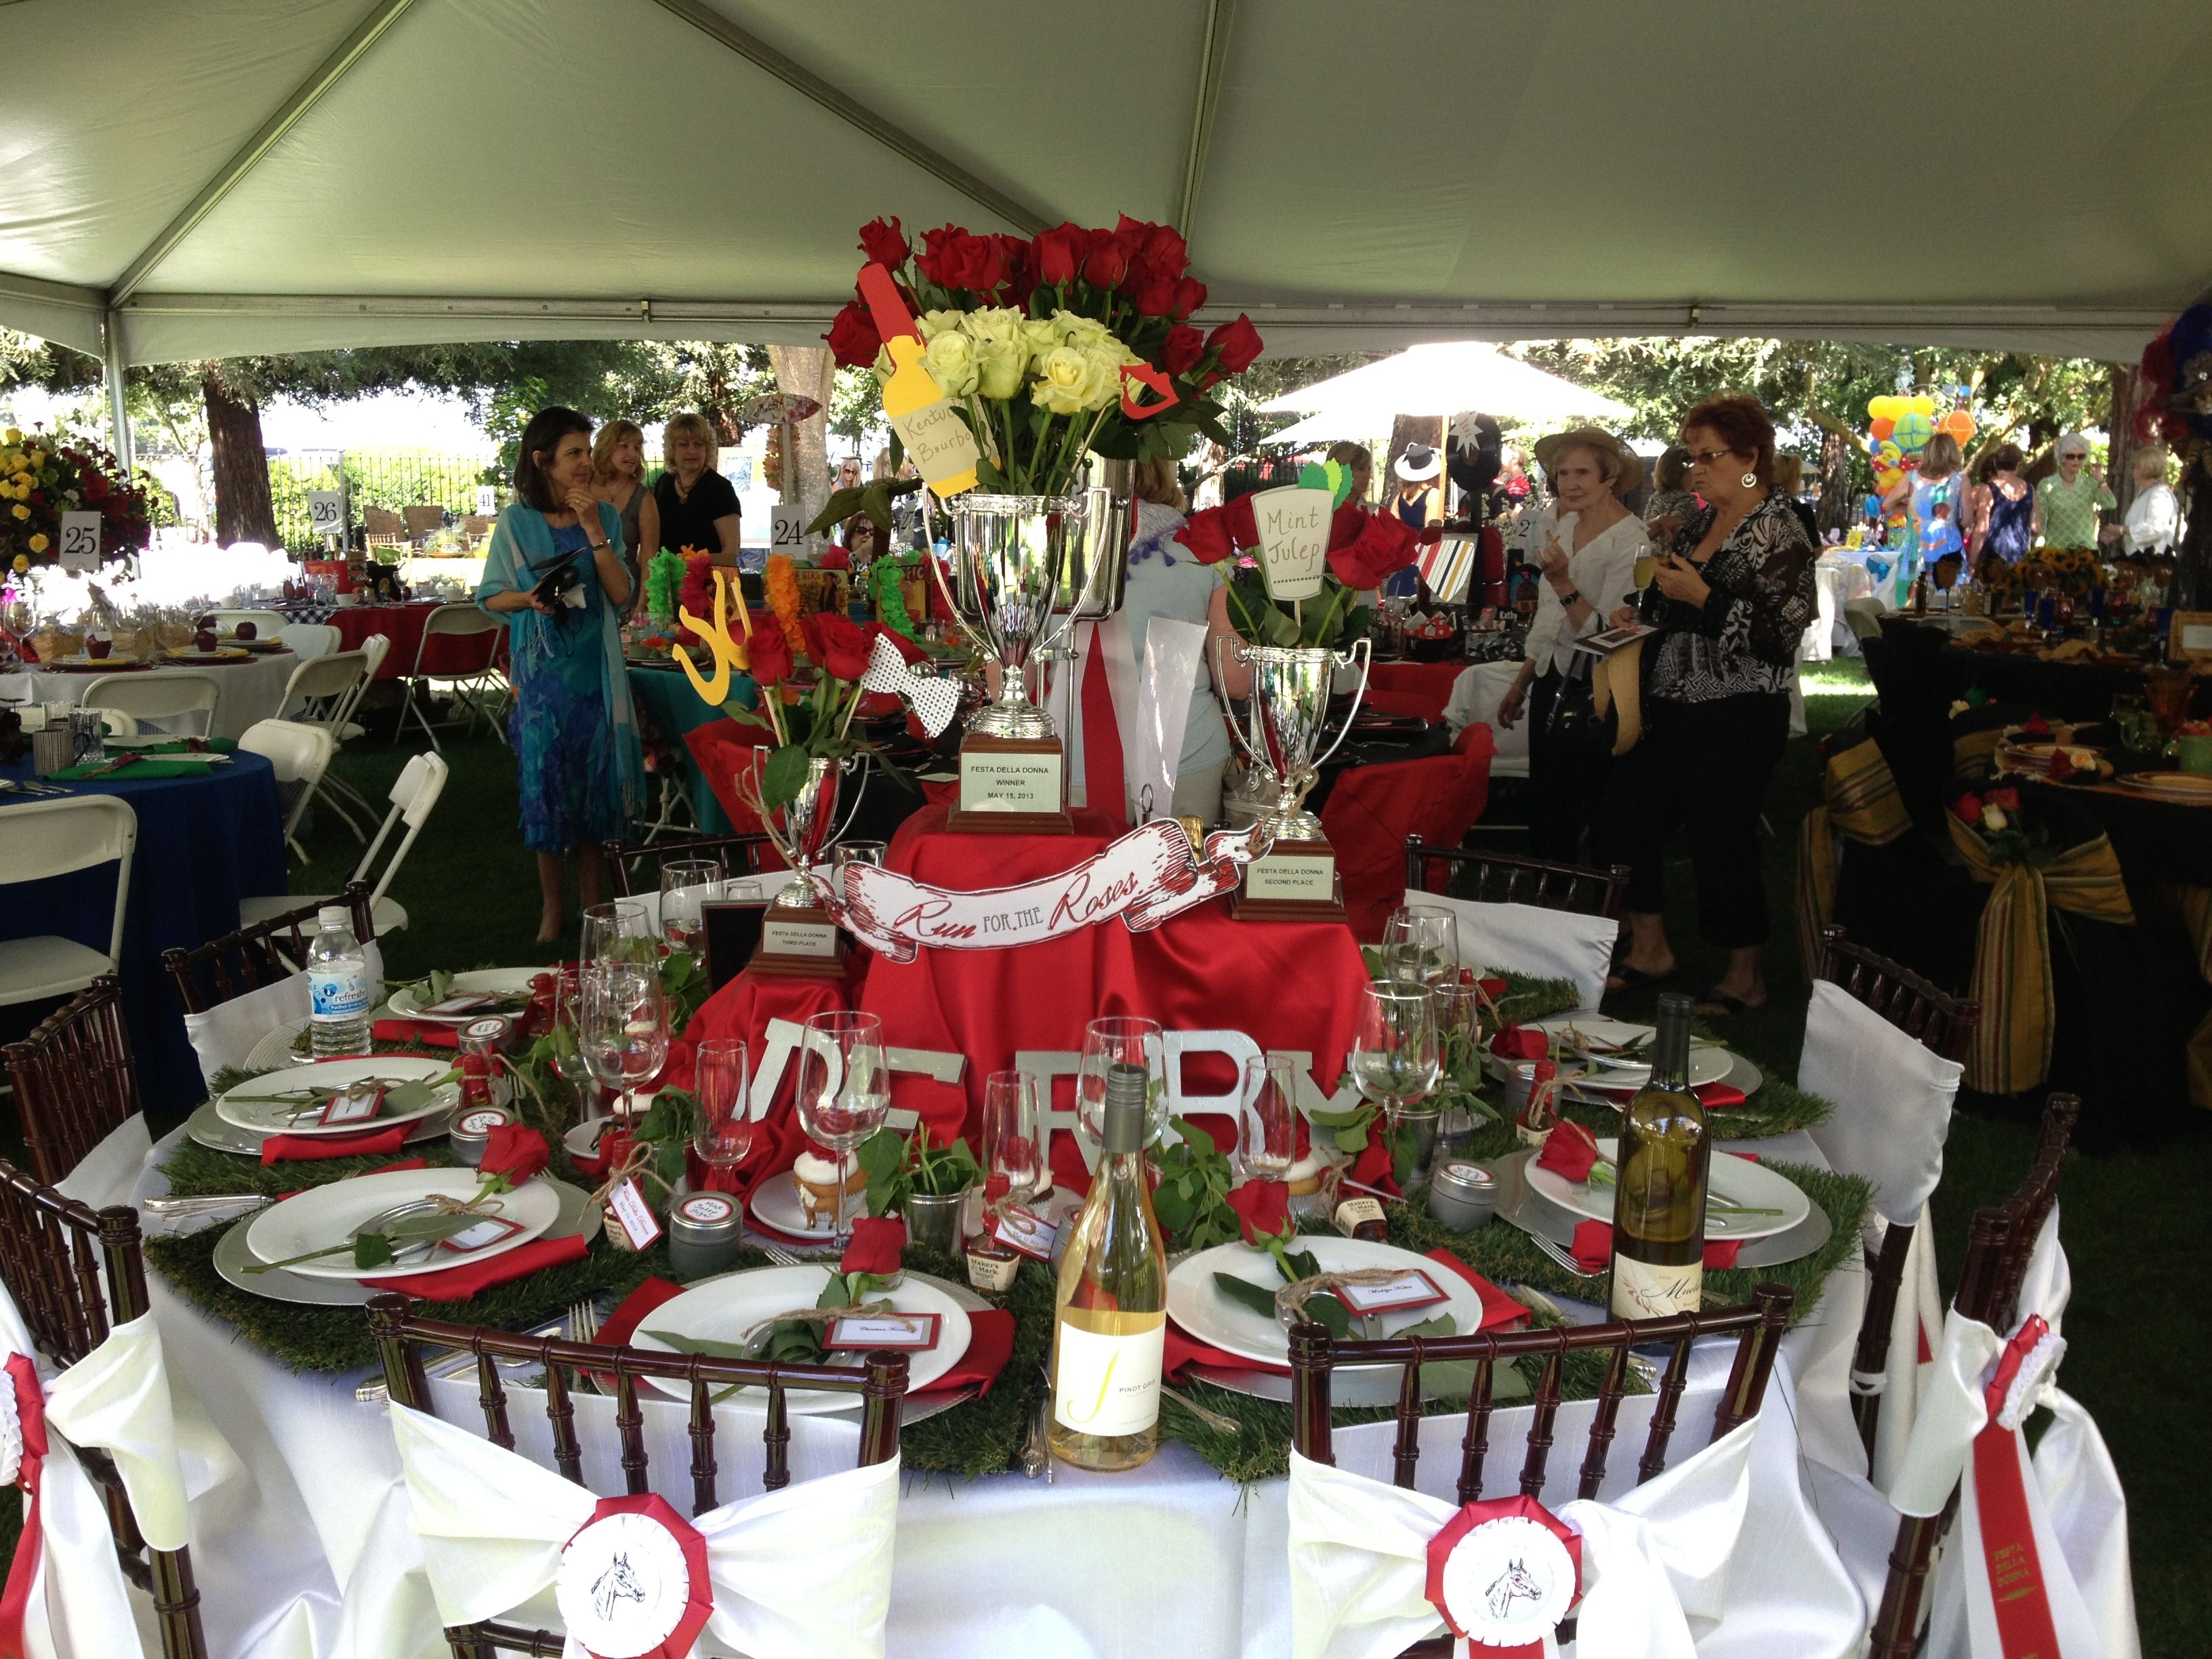 Kentucky Derby Party Ideas On Pinterest Horse Racing